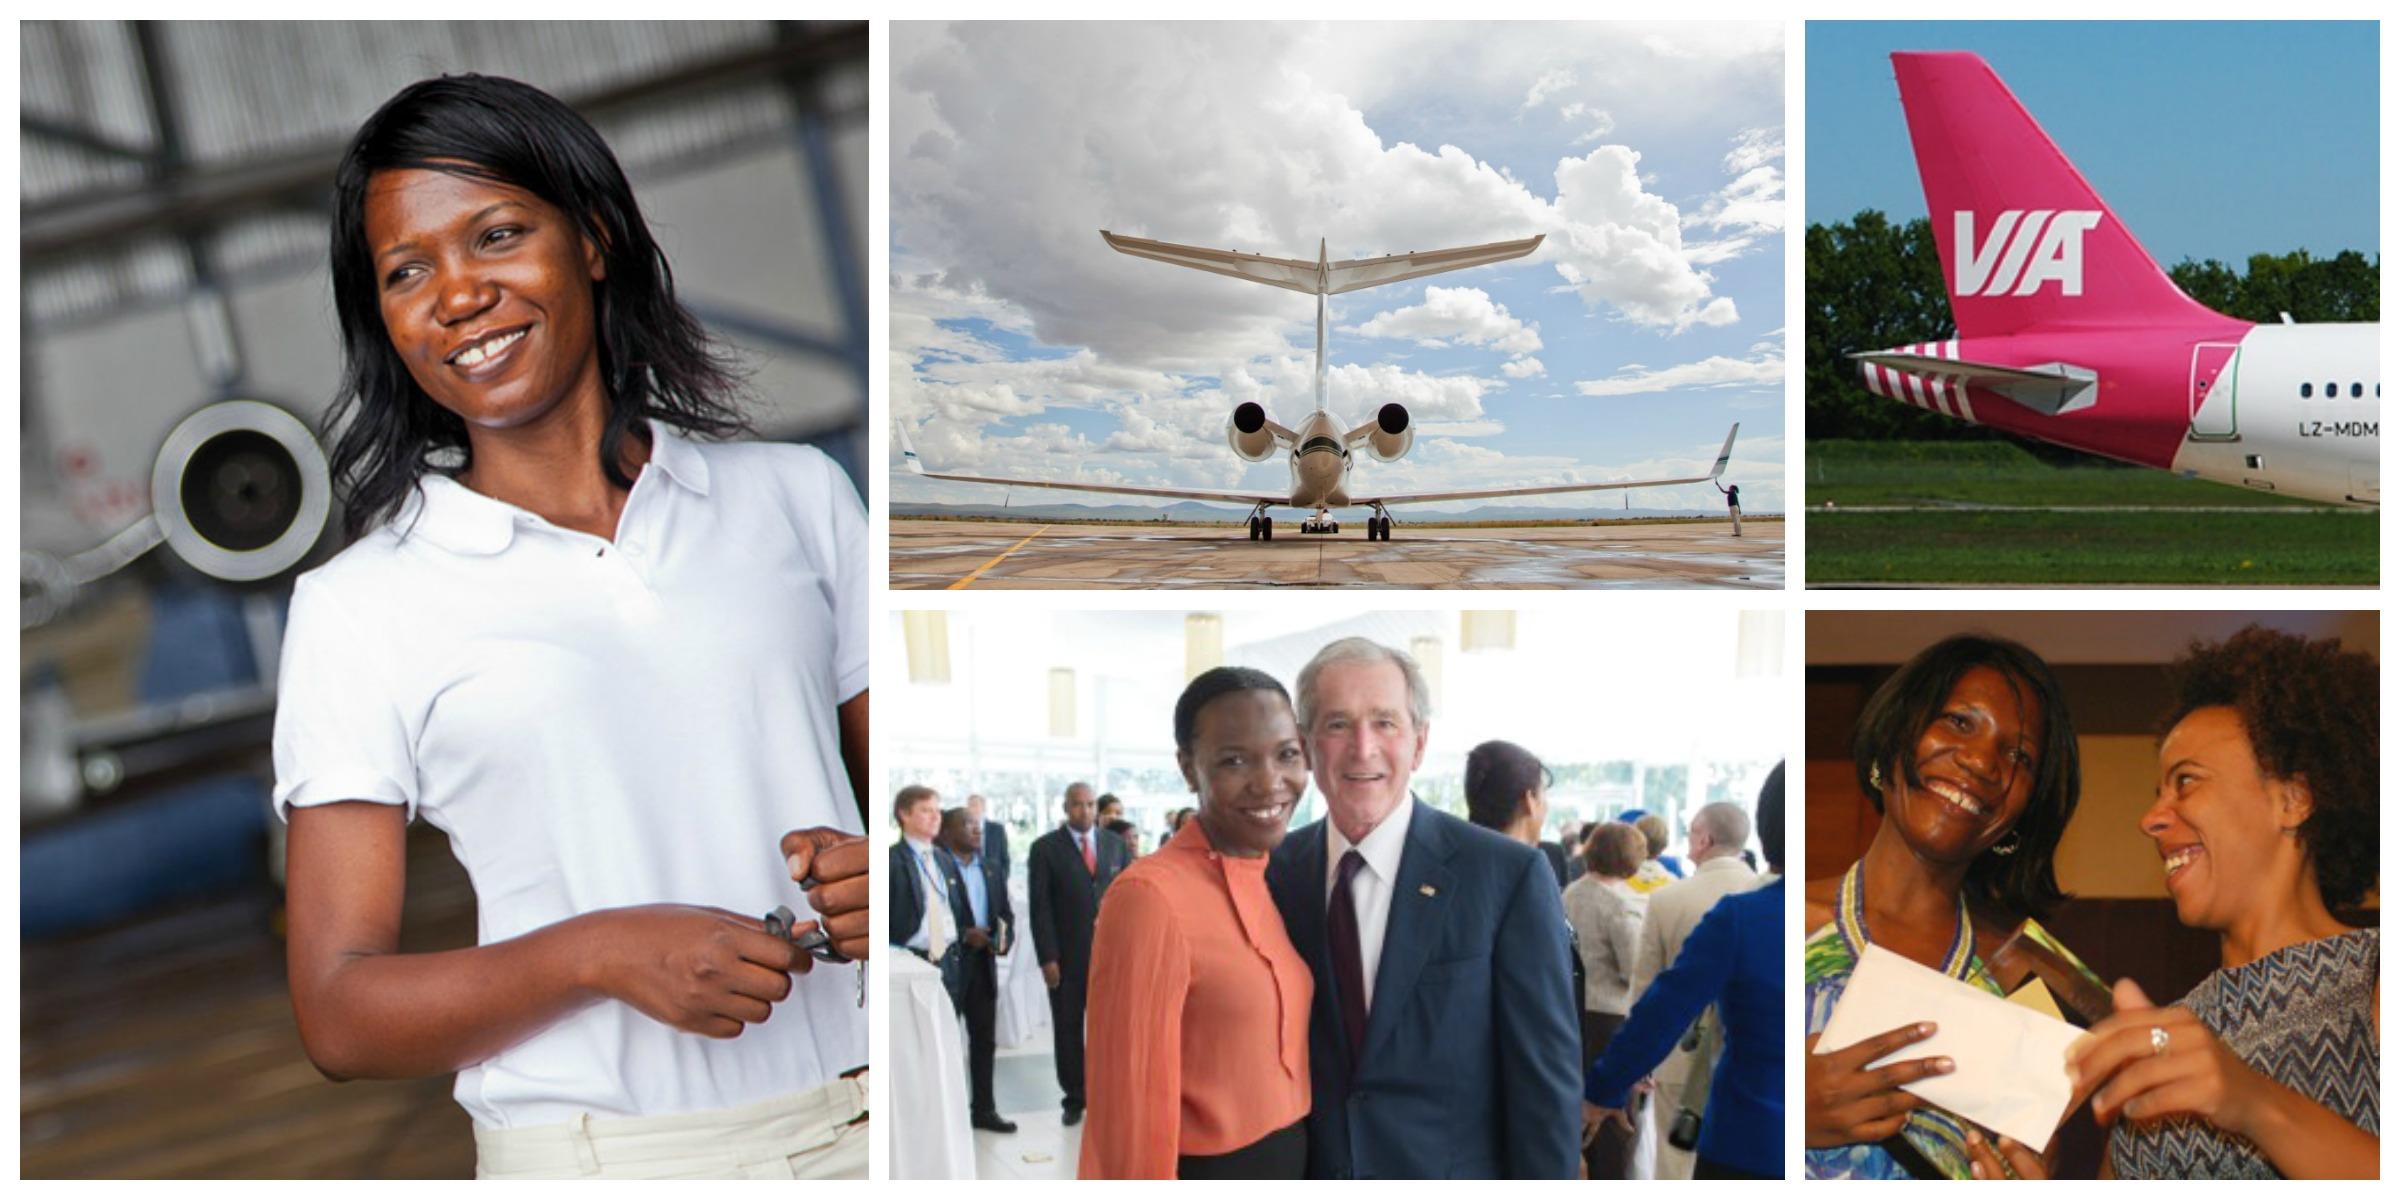 Susan Mashibe, founder of VIA Aviation